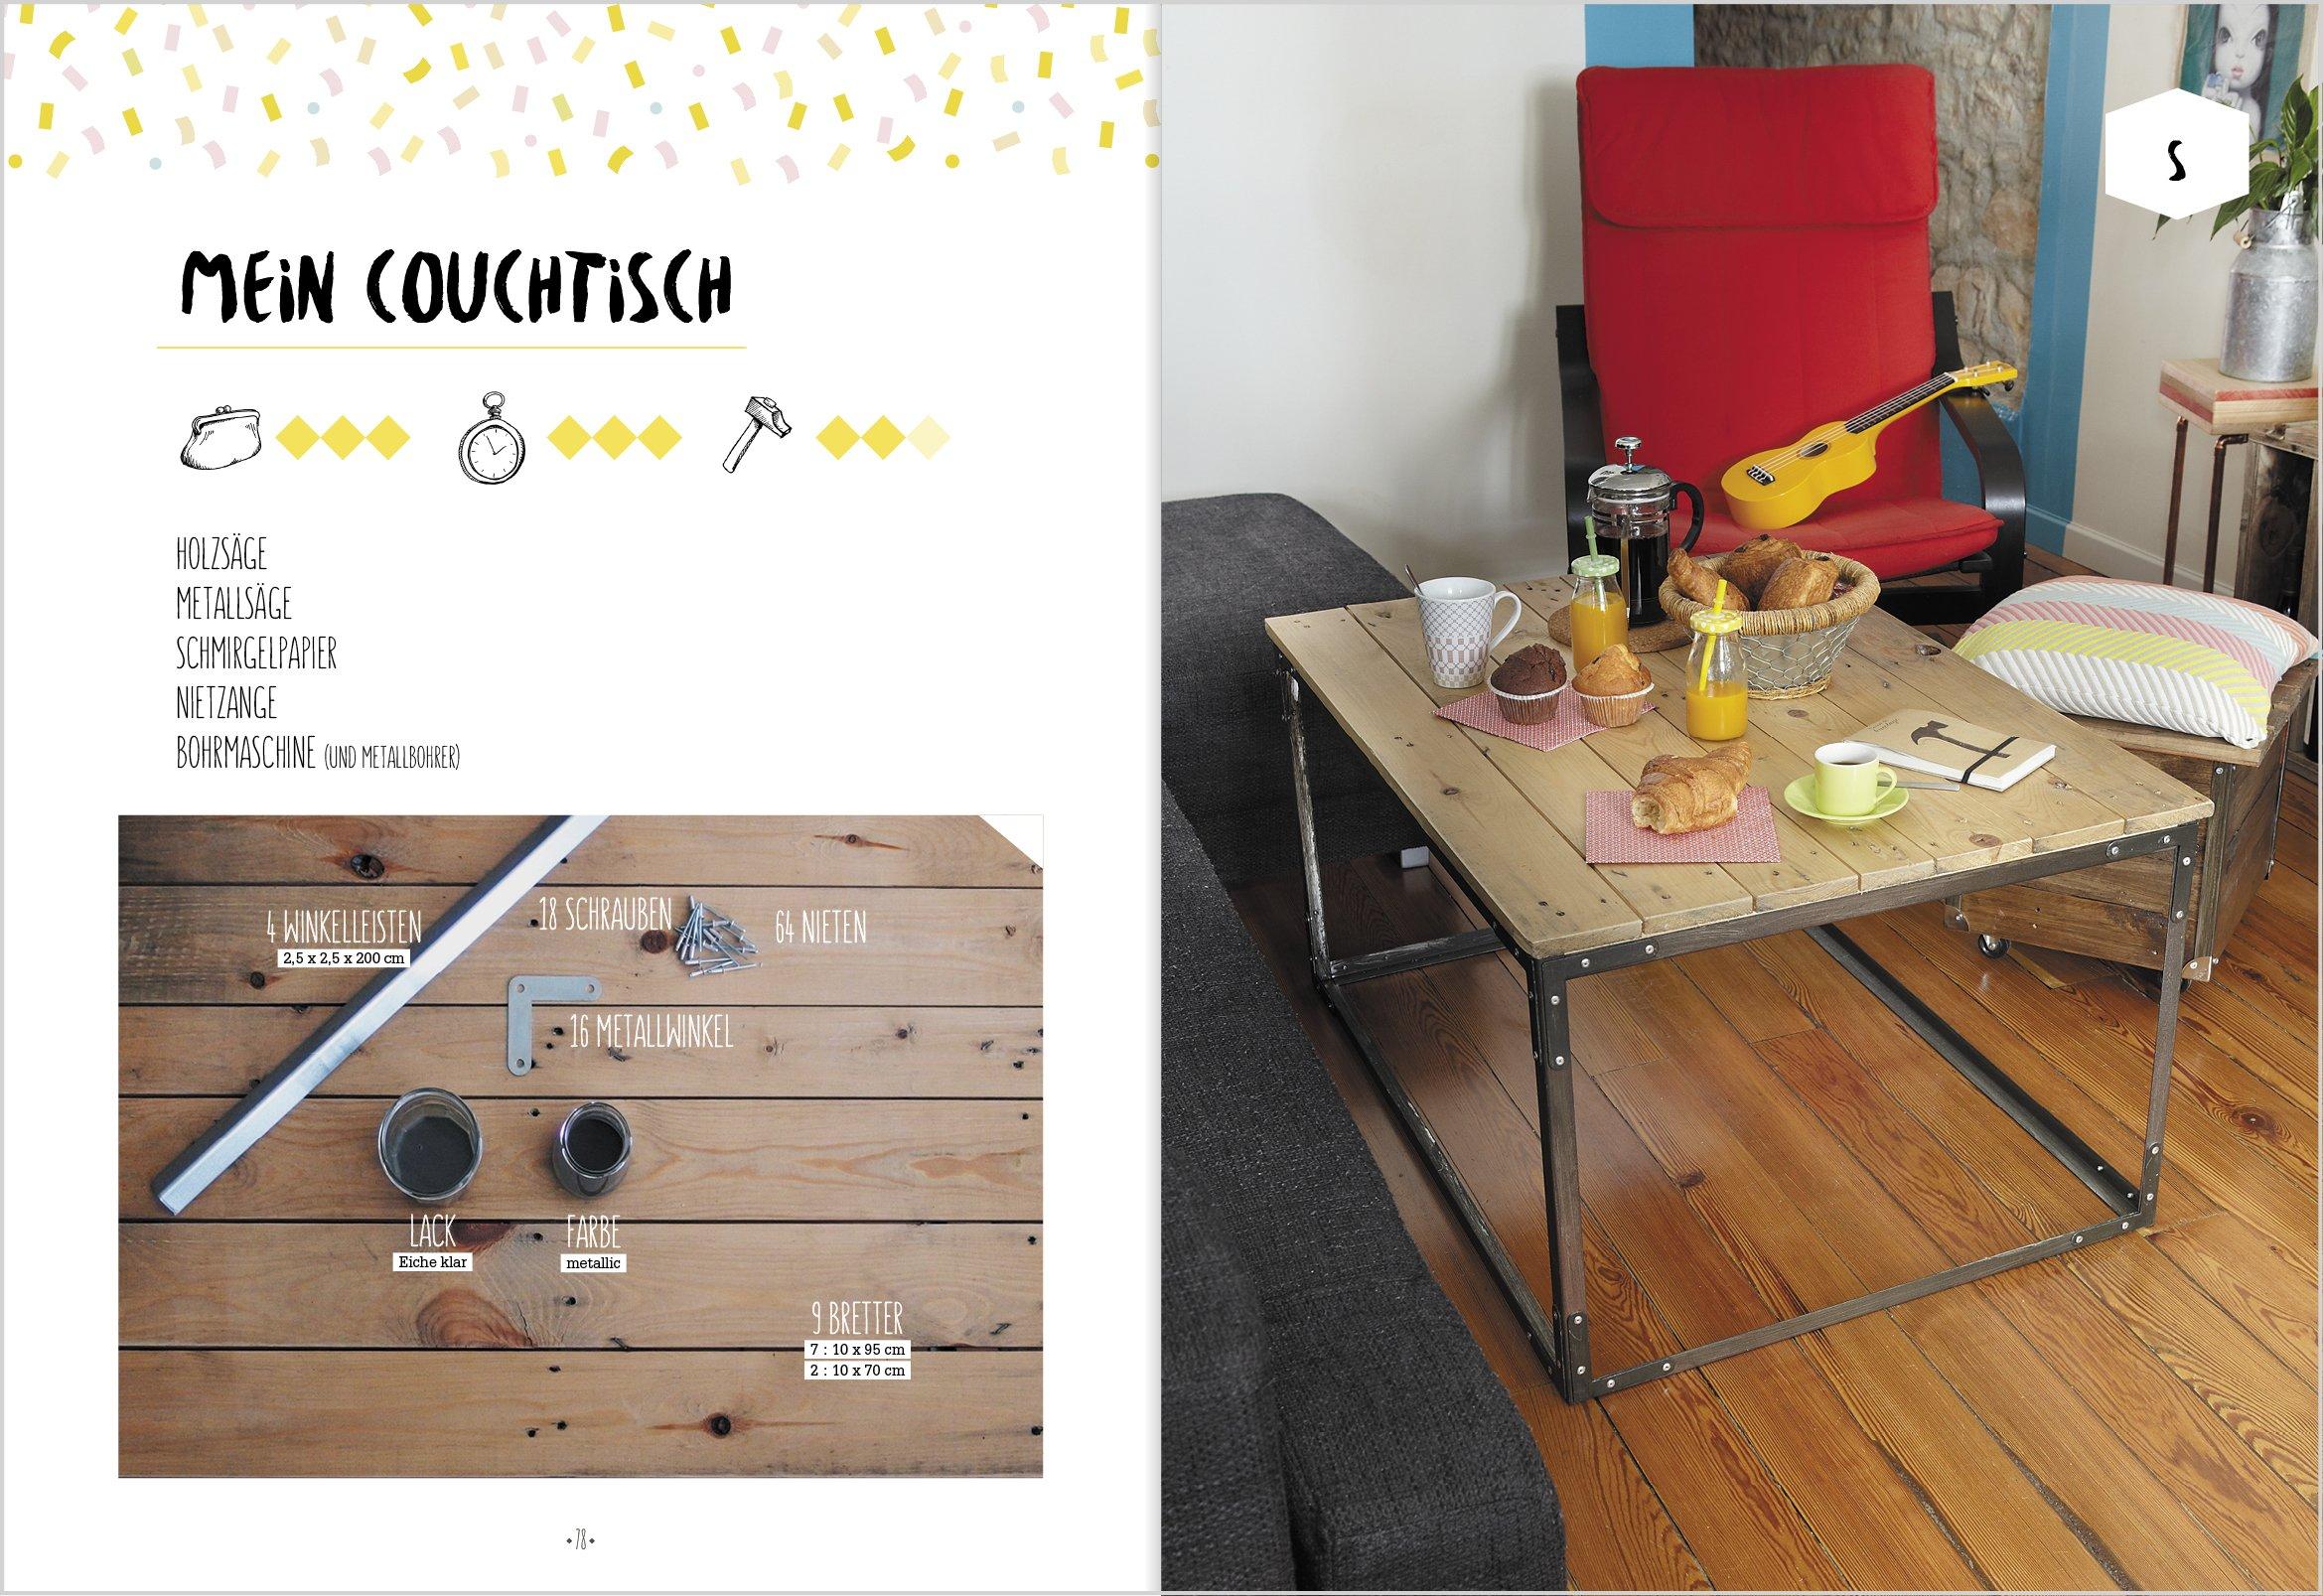 Genial Einfache Holz Ideen: 20 Anleitungen Zum Sägen, Kleben, Loslegen.:  Amazon.de: Maud Vignane, Sarah El Karmiti: Bücher